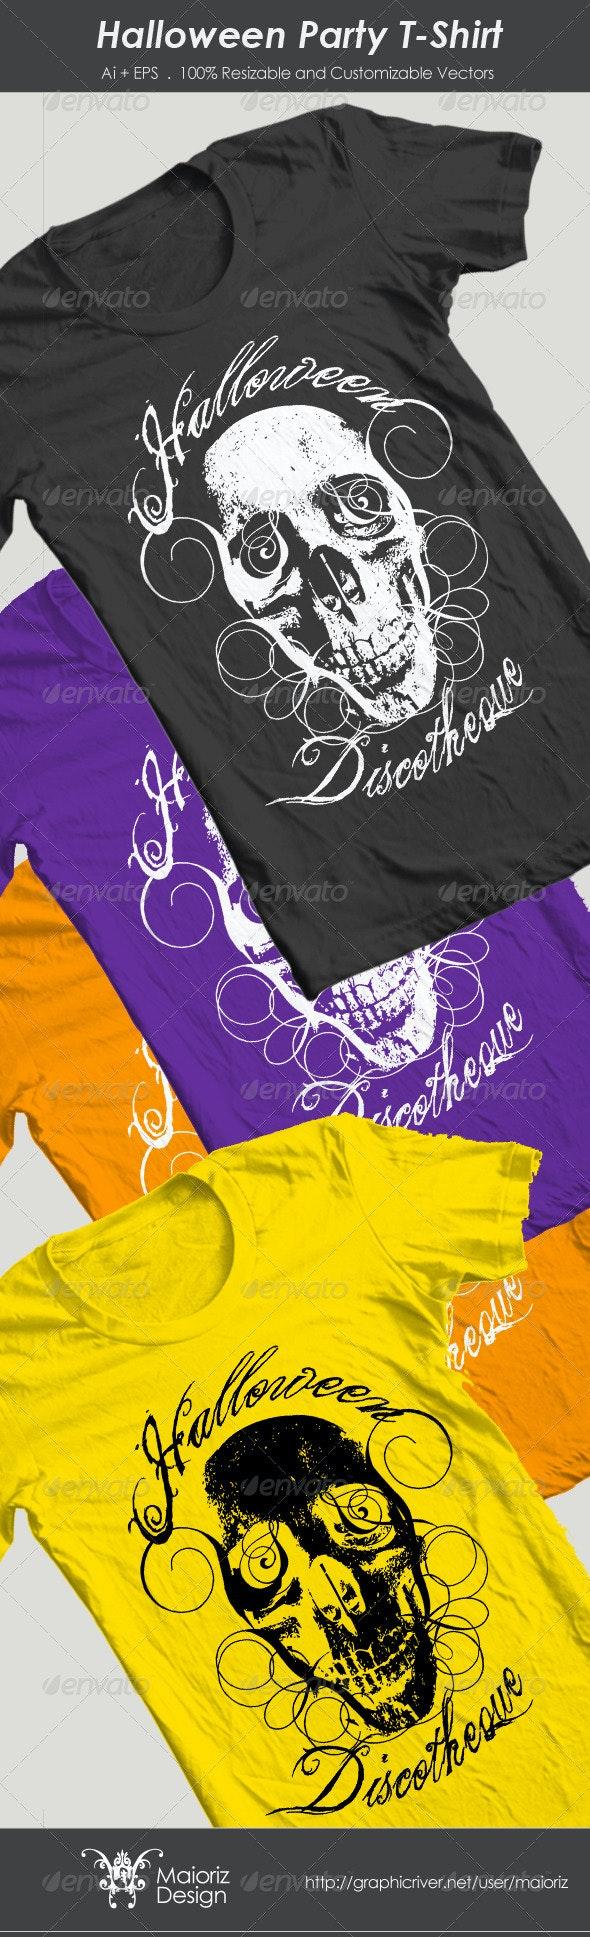 Halloween Party T-Shirt - Grunge Designs